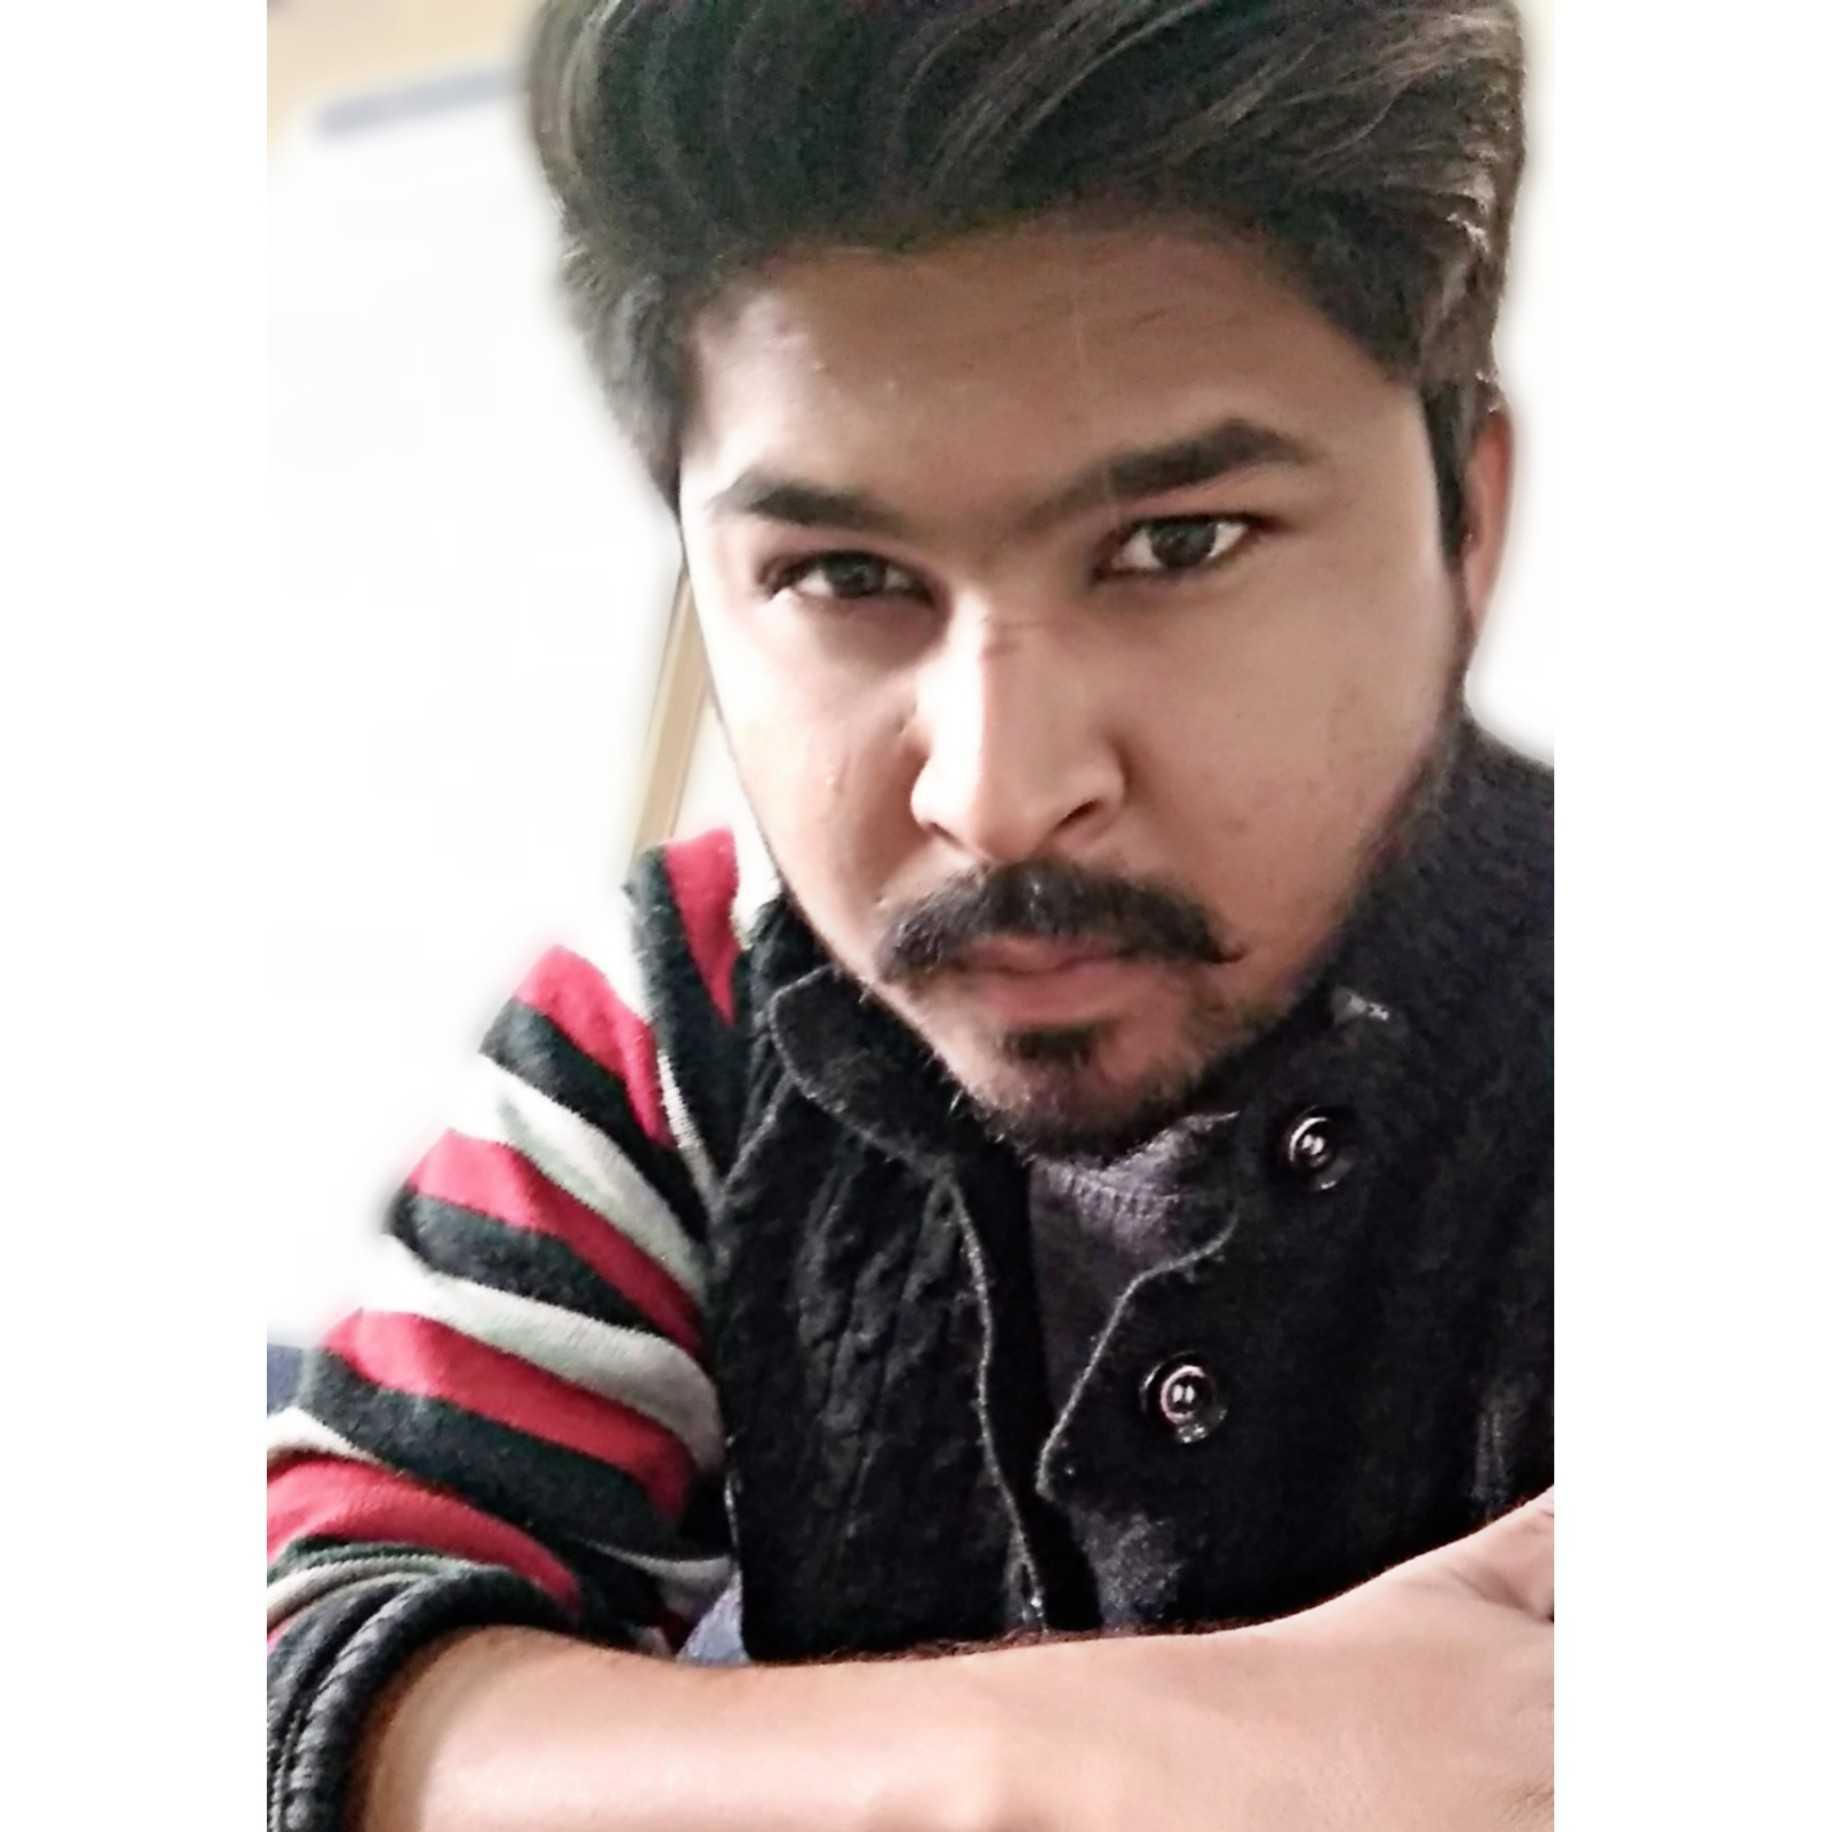 bin_kahin_baatein1464 student of mathematics, Dil ki baatein_ dil mein nhi rakh pata to shayari ban jati hai_